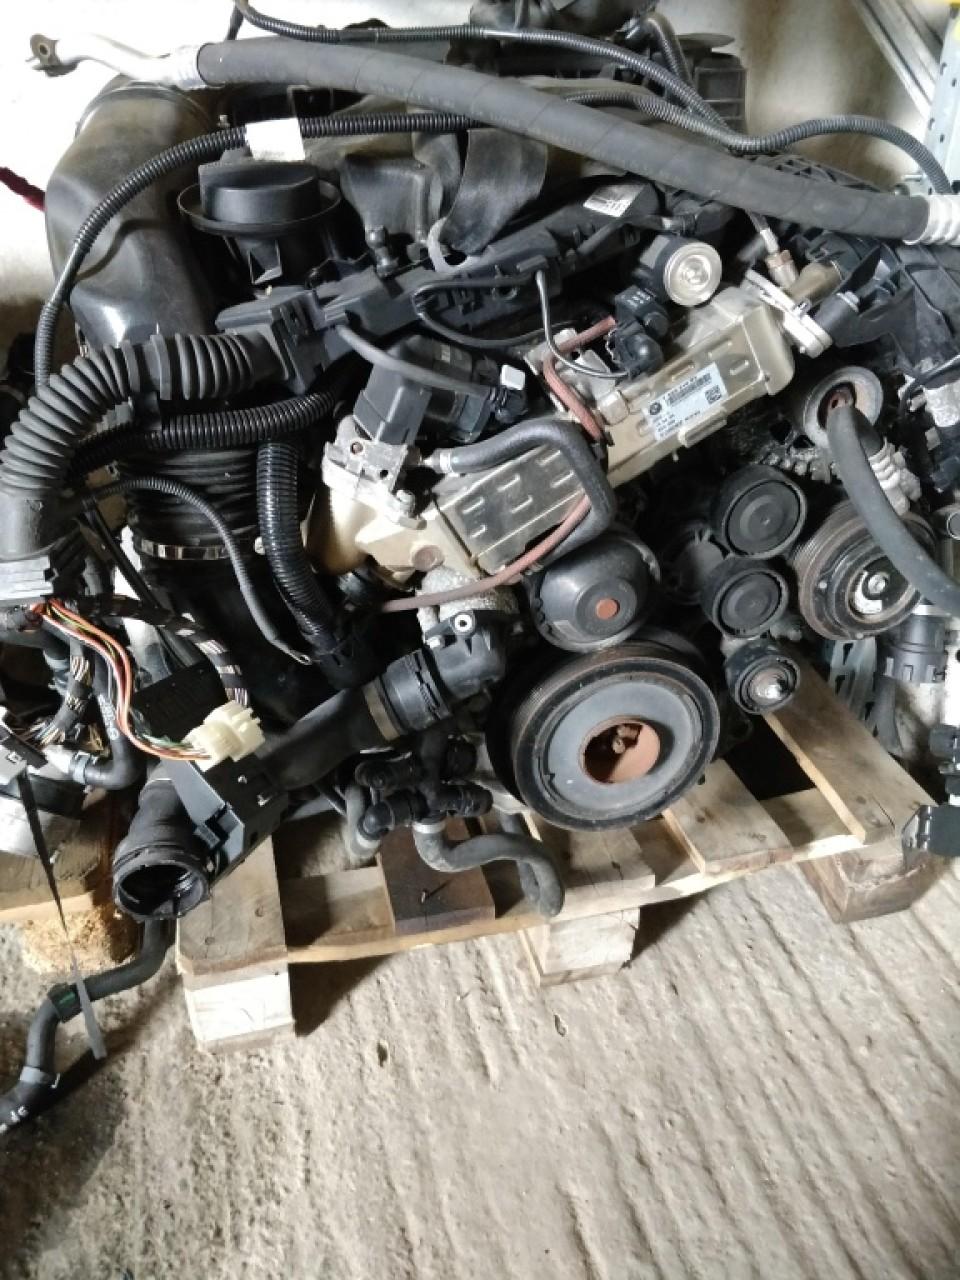 Compresor AC BMW Seria 3 F30 / Seria 5 F07 F10 F11 / Seria 6 F06 F12 F13 / Seria 7 F01 / X5 E70 F15